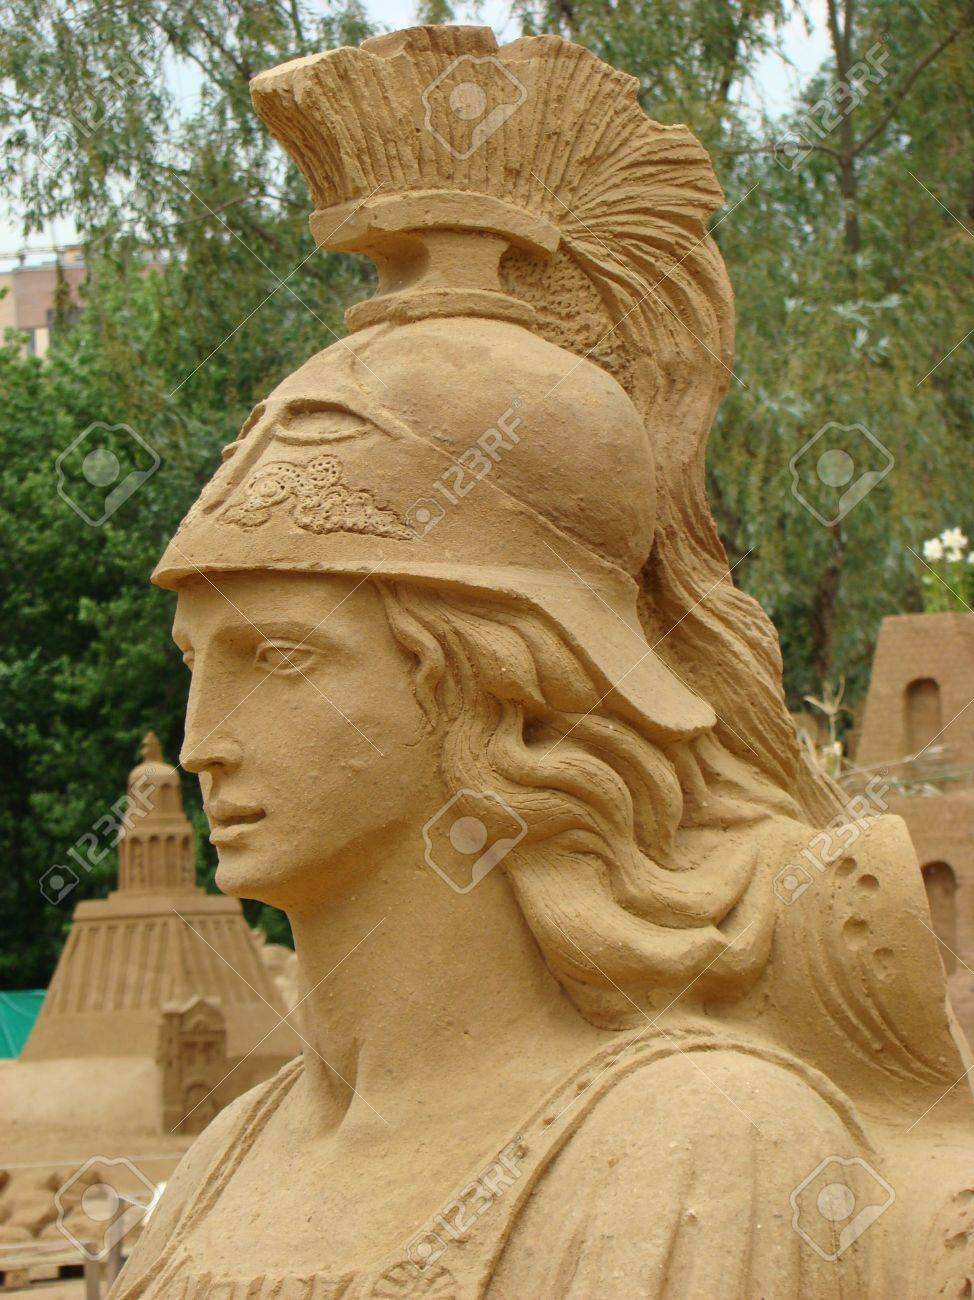 sand figure of athena in ancient greek mythology of the goddess